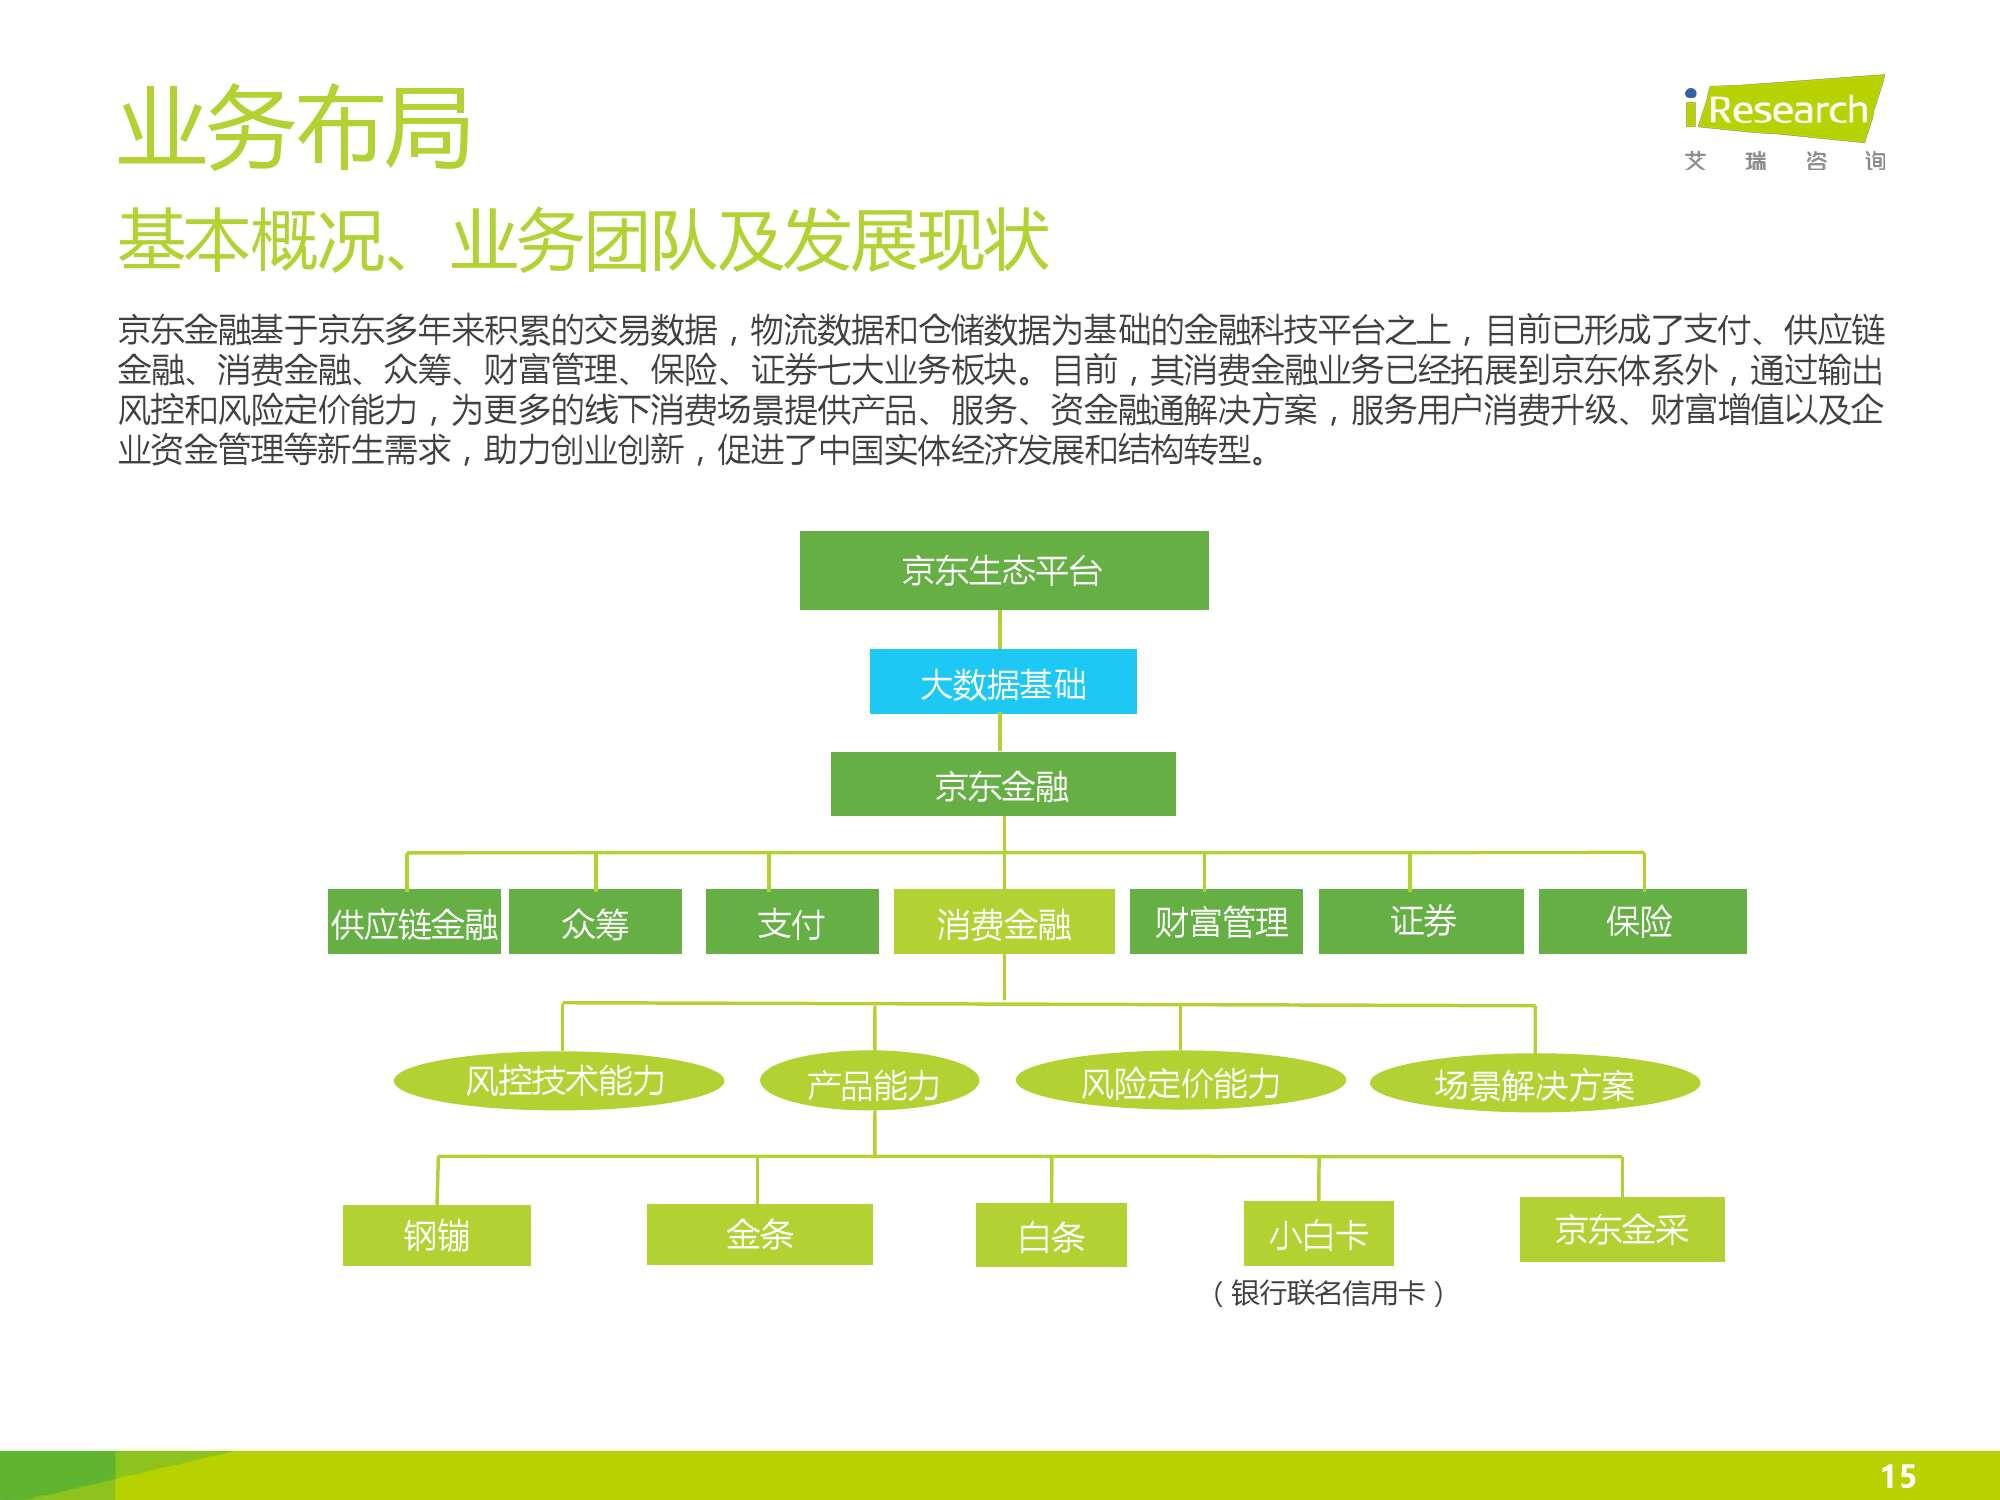 iResearch-2016年中国互联网消费金融市场研究报告_000015